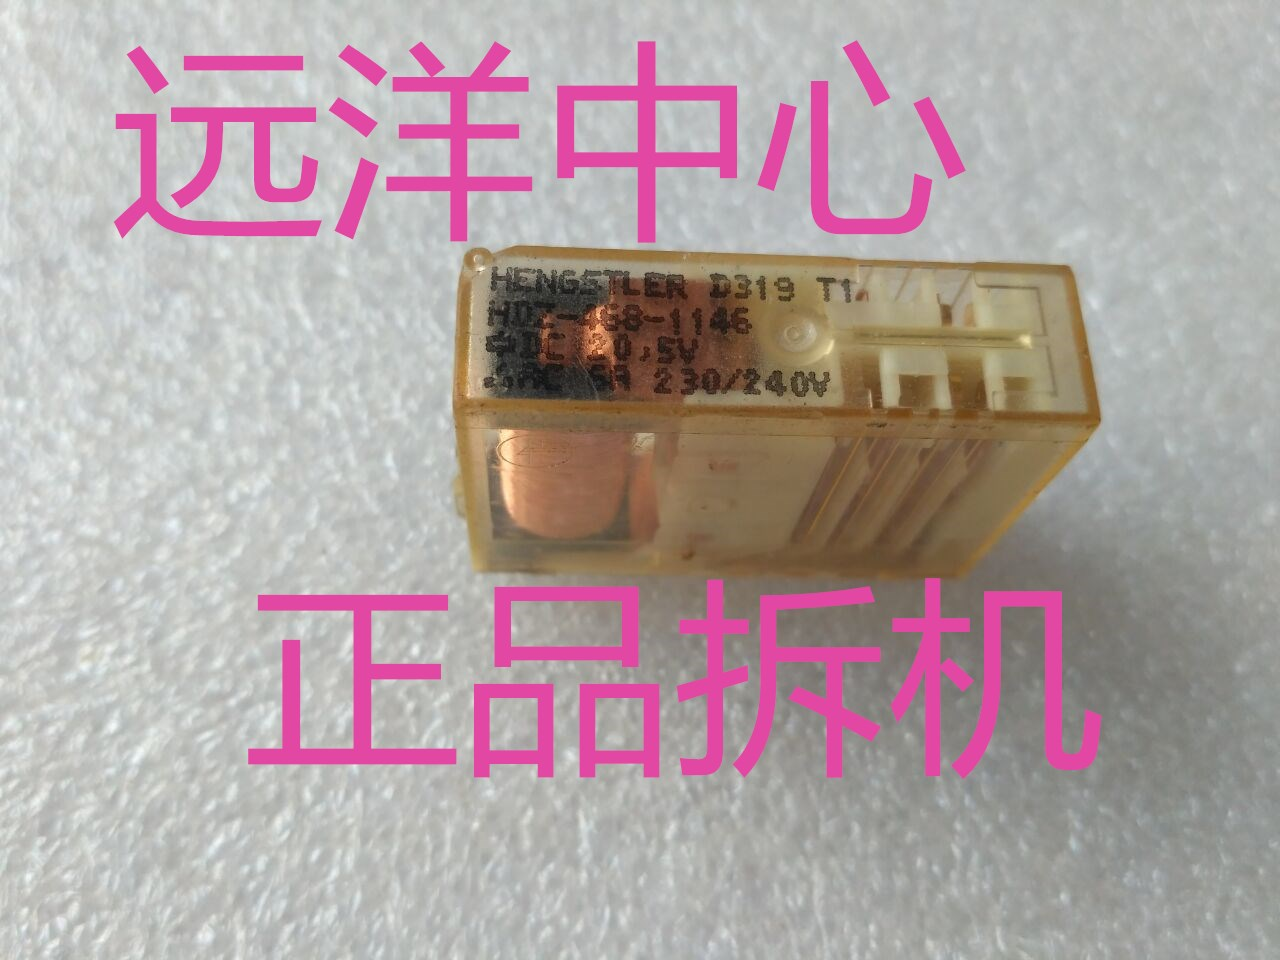 цена на HDZ-468-1146 DC20.5V  6A  10